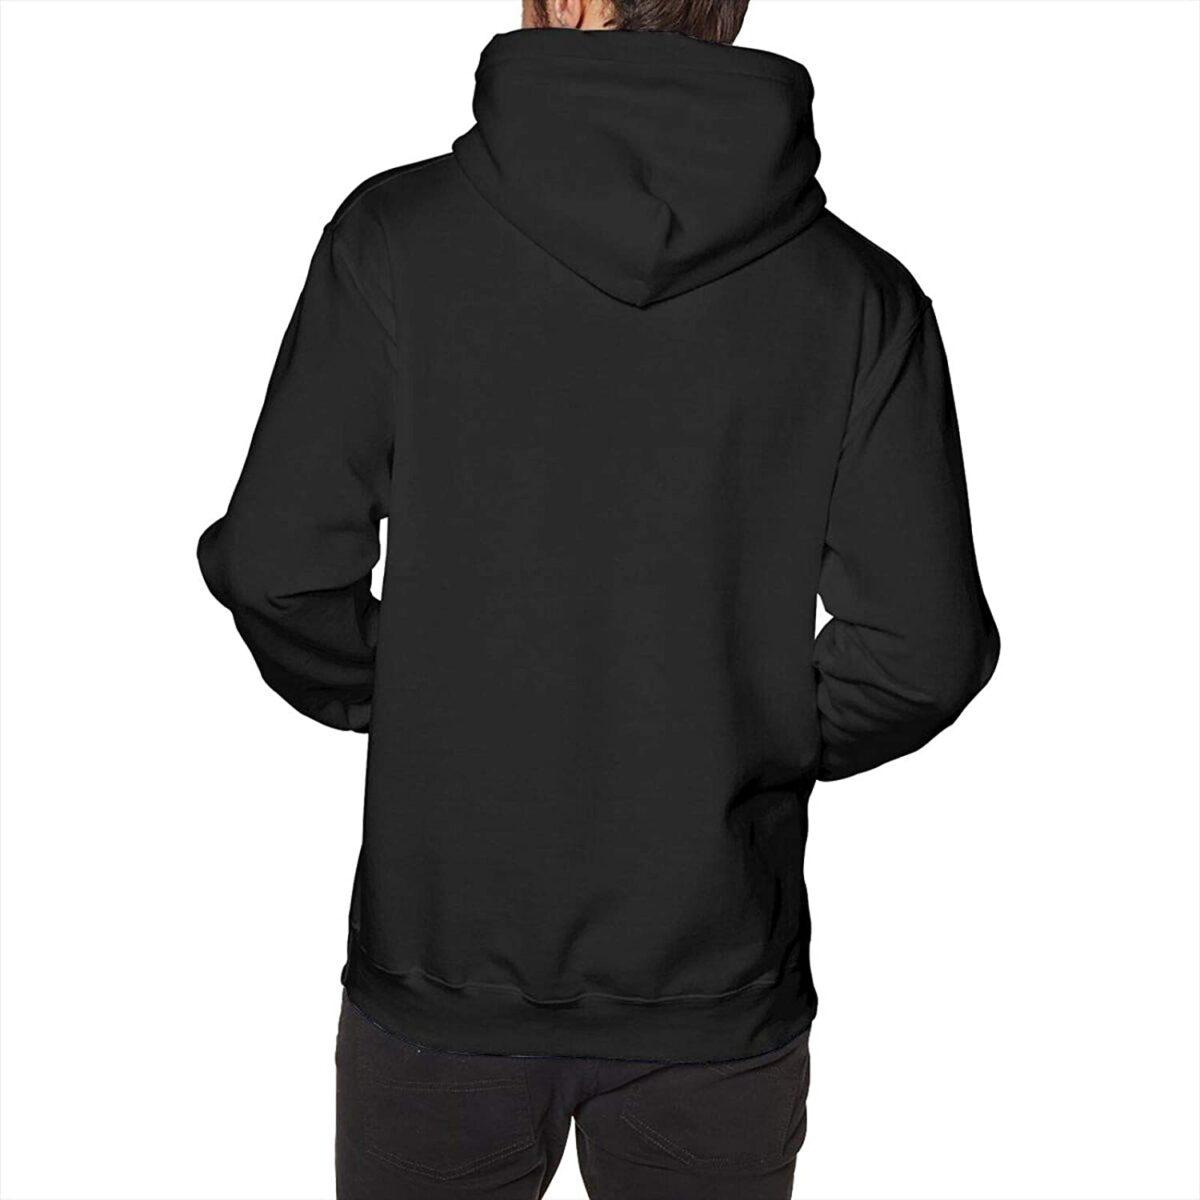 TRIOEPU Shroud Long Sleeve Pullover Hoodies Casual Light Hooded Sweatshirt